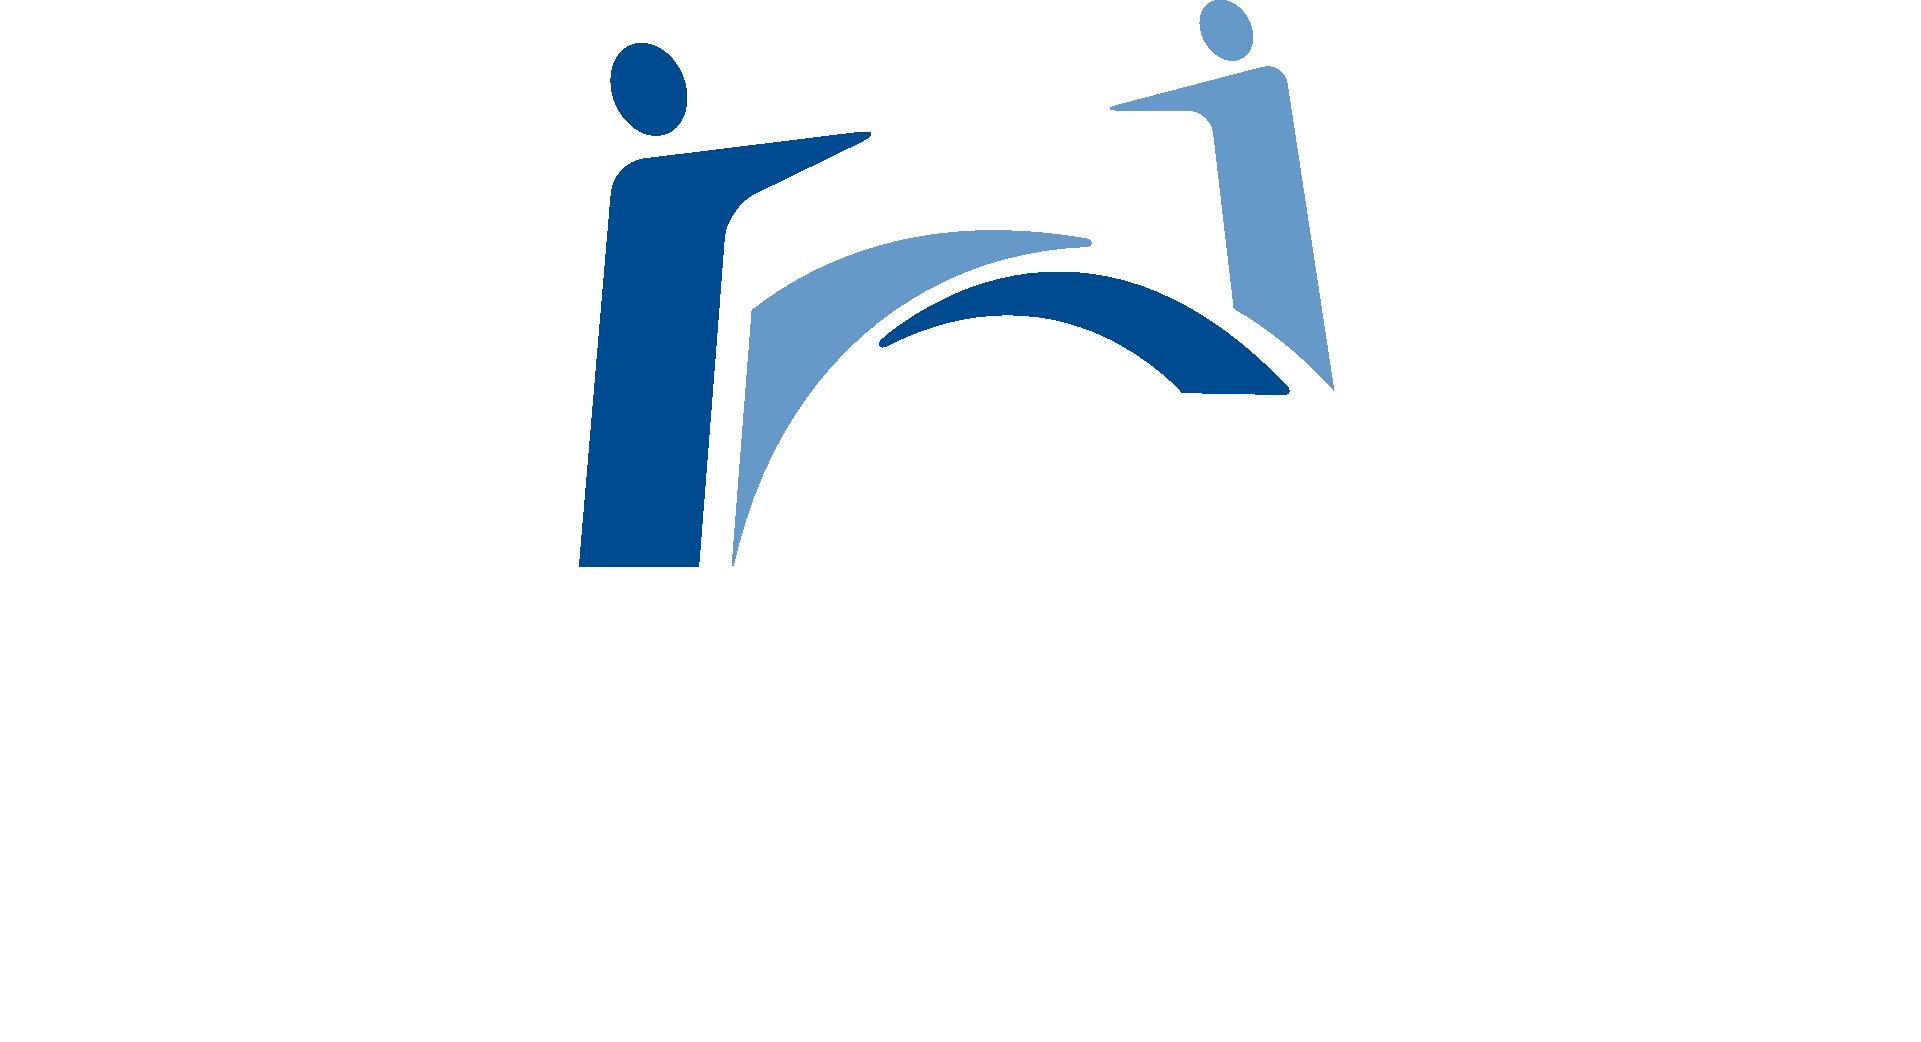 Personnel.com